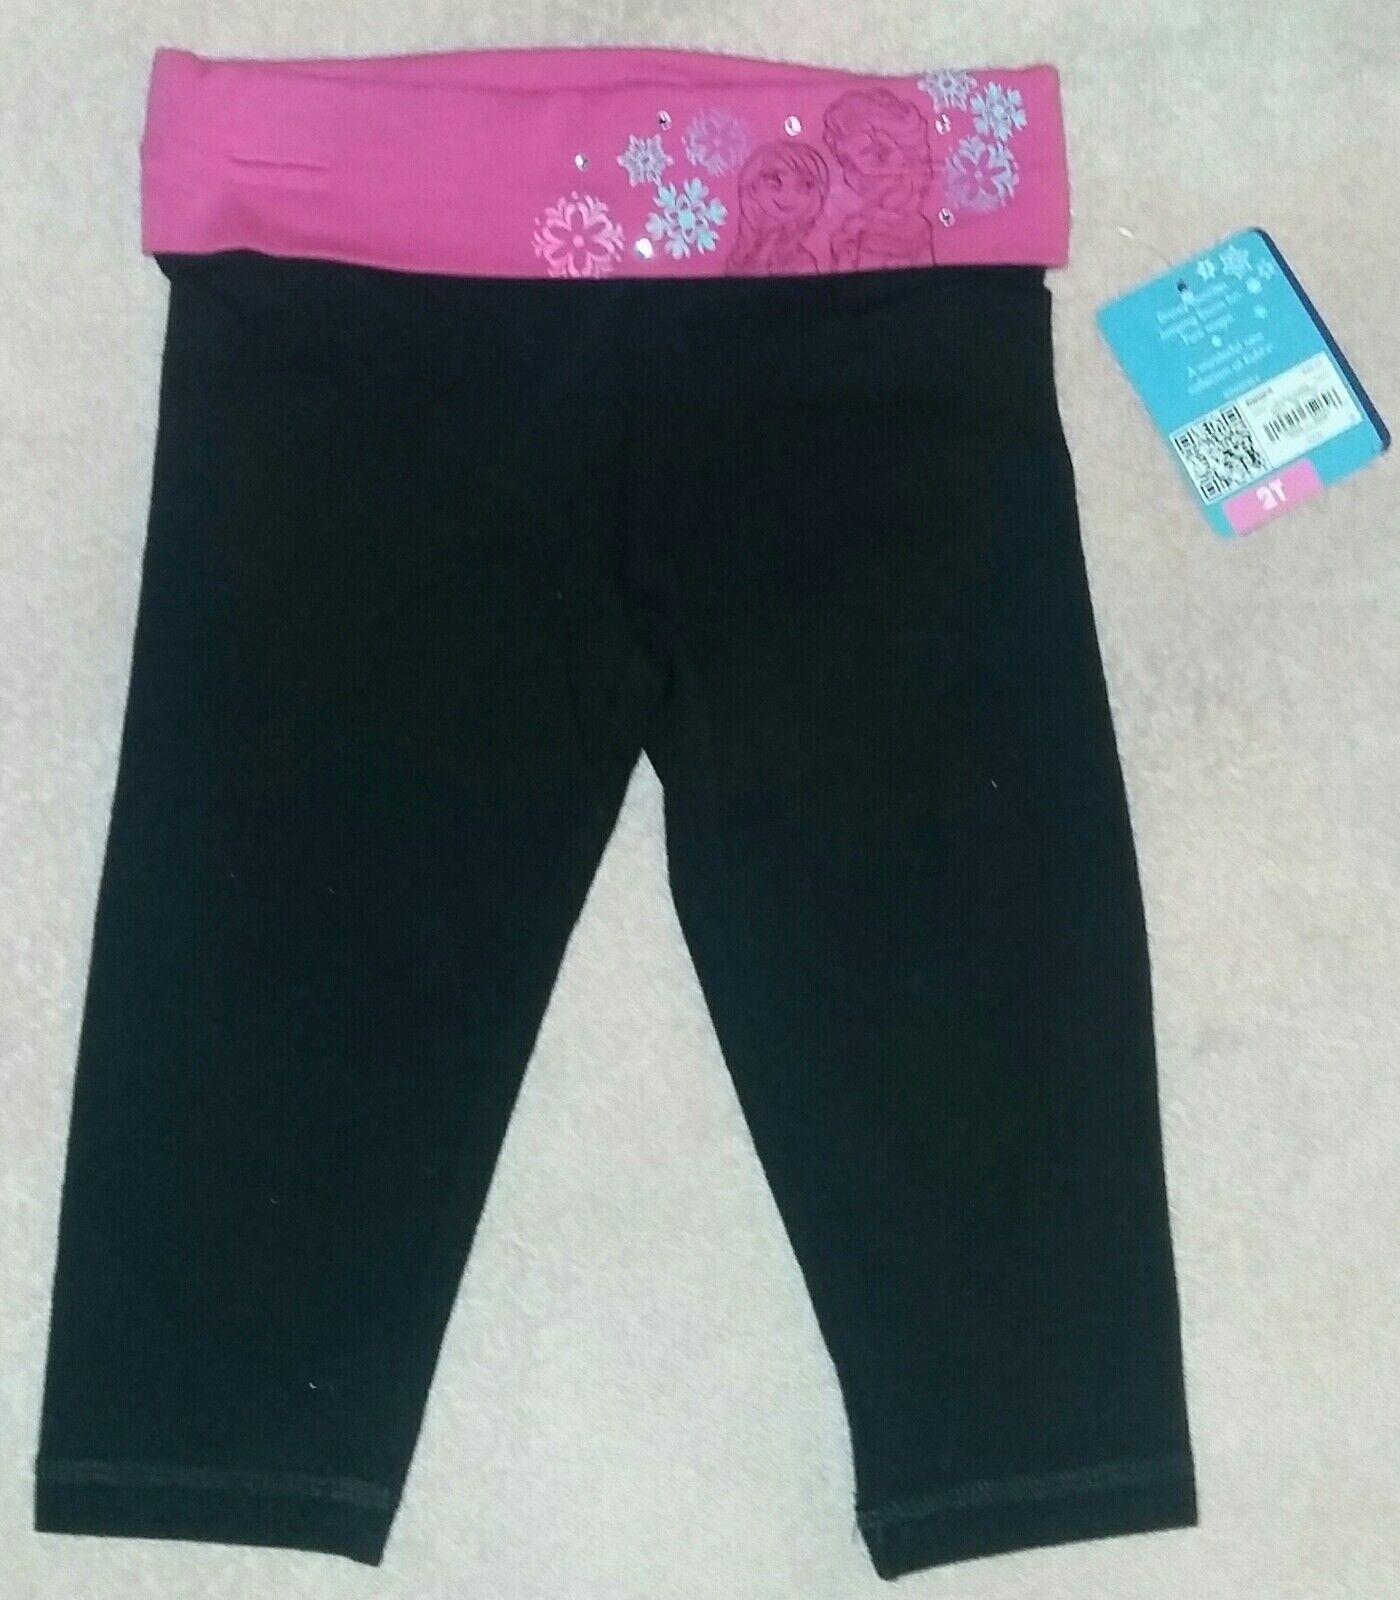 NEW Jumping Beans Toddler Girl Long Jegging Pants Cheetah Print Black /& White 4T